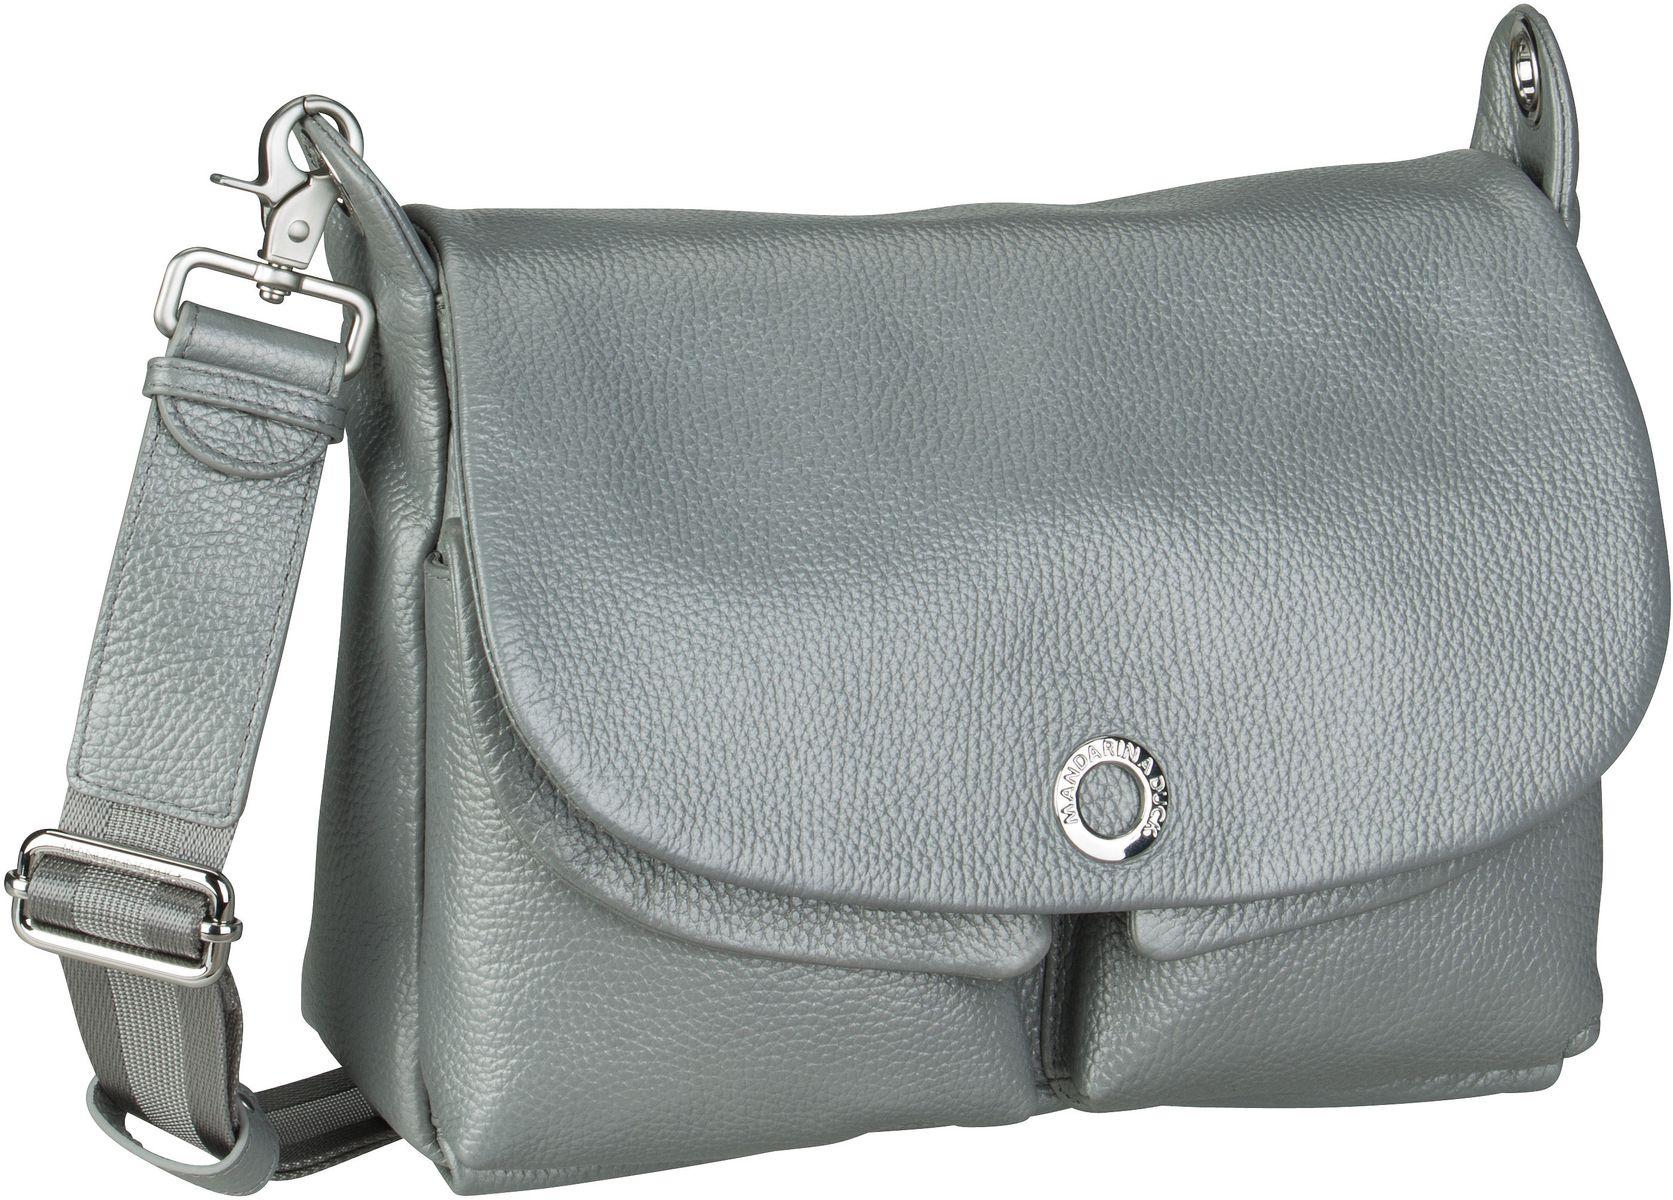 Umhängetasche Mellow Leather Lux Shoulder Bag ZLT23 Silver